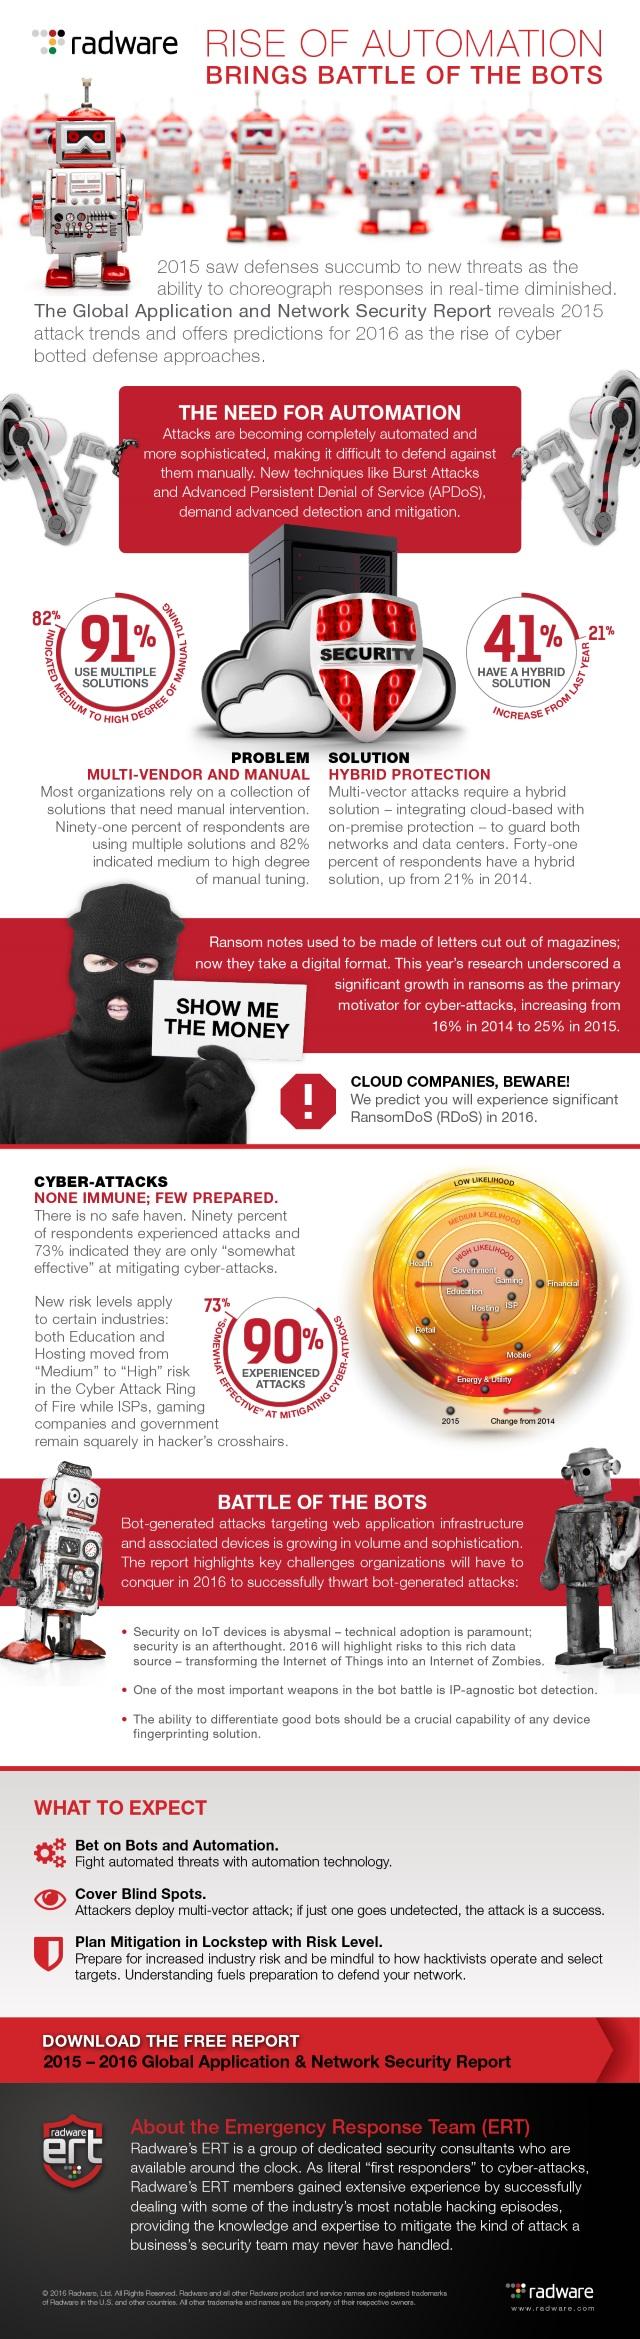 Radware bot infographic